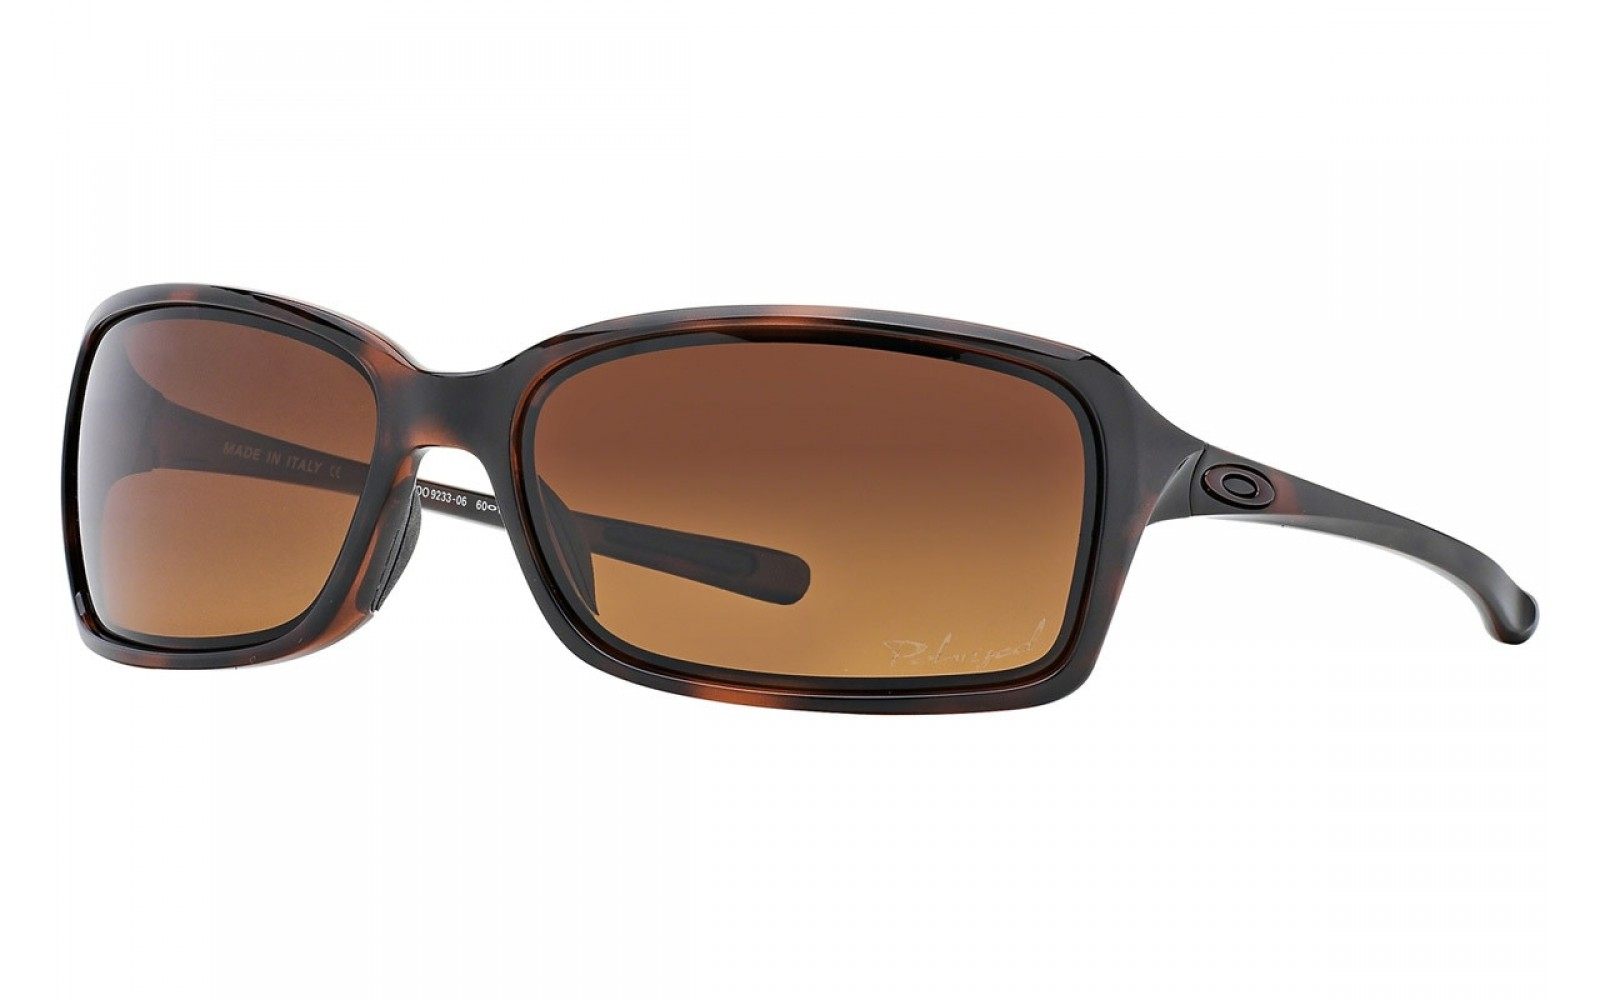 Oakley Dispute - Tortoise / Brown Gradient Polarized - OO9233-06 Zonnebril